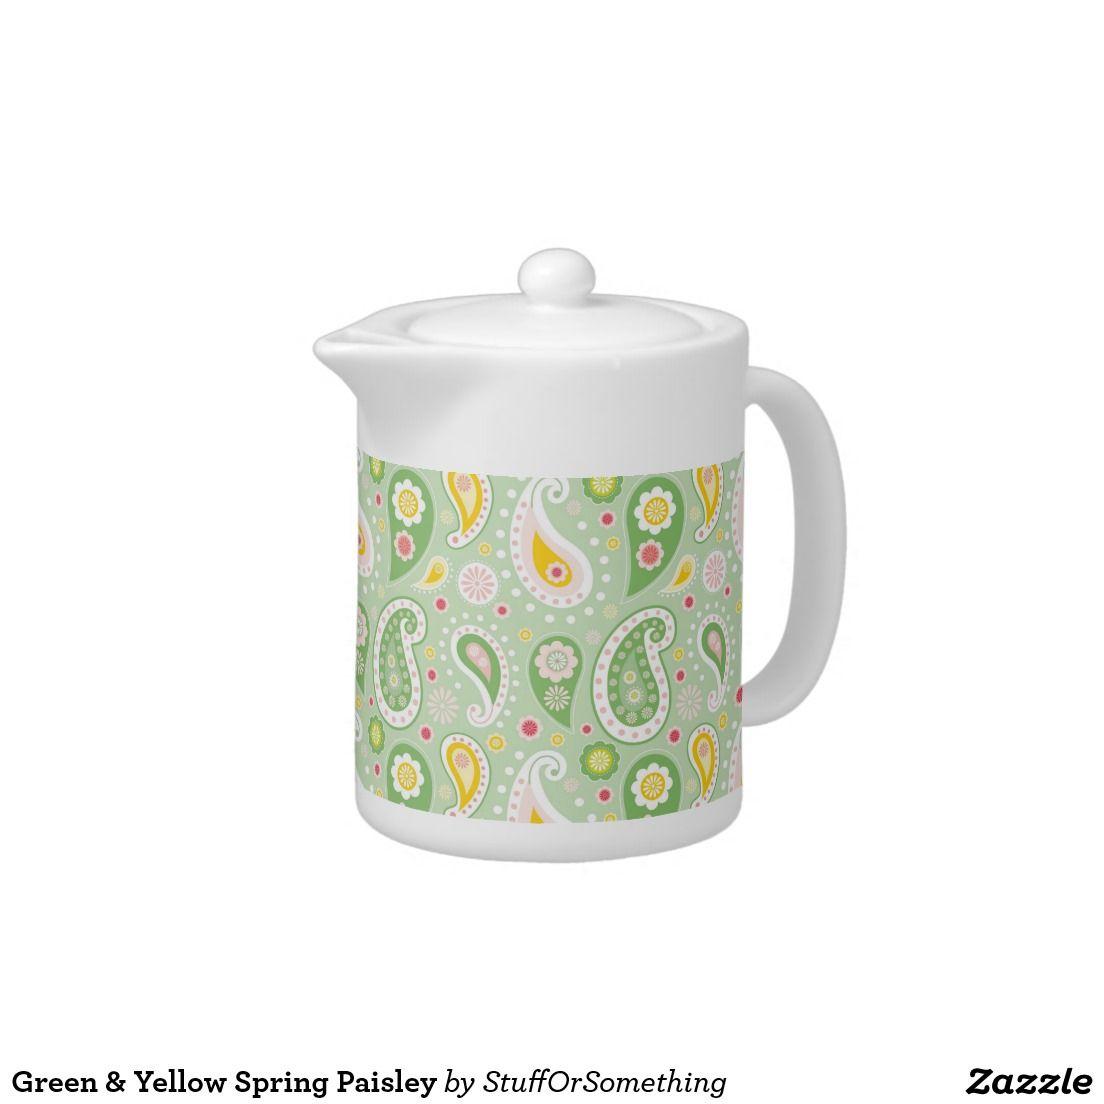 Green & Yellow Spring Paisley Small Tea Pots (x8)